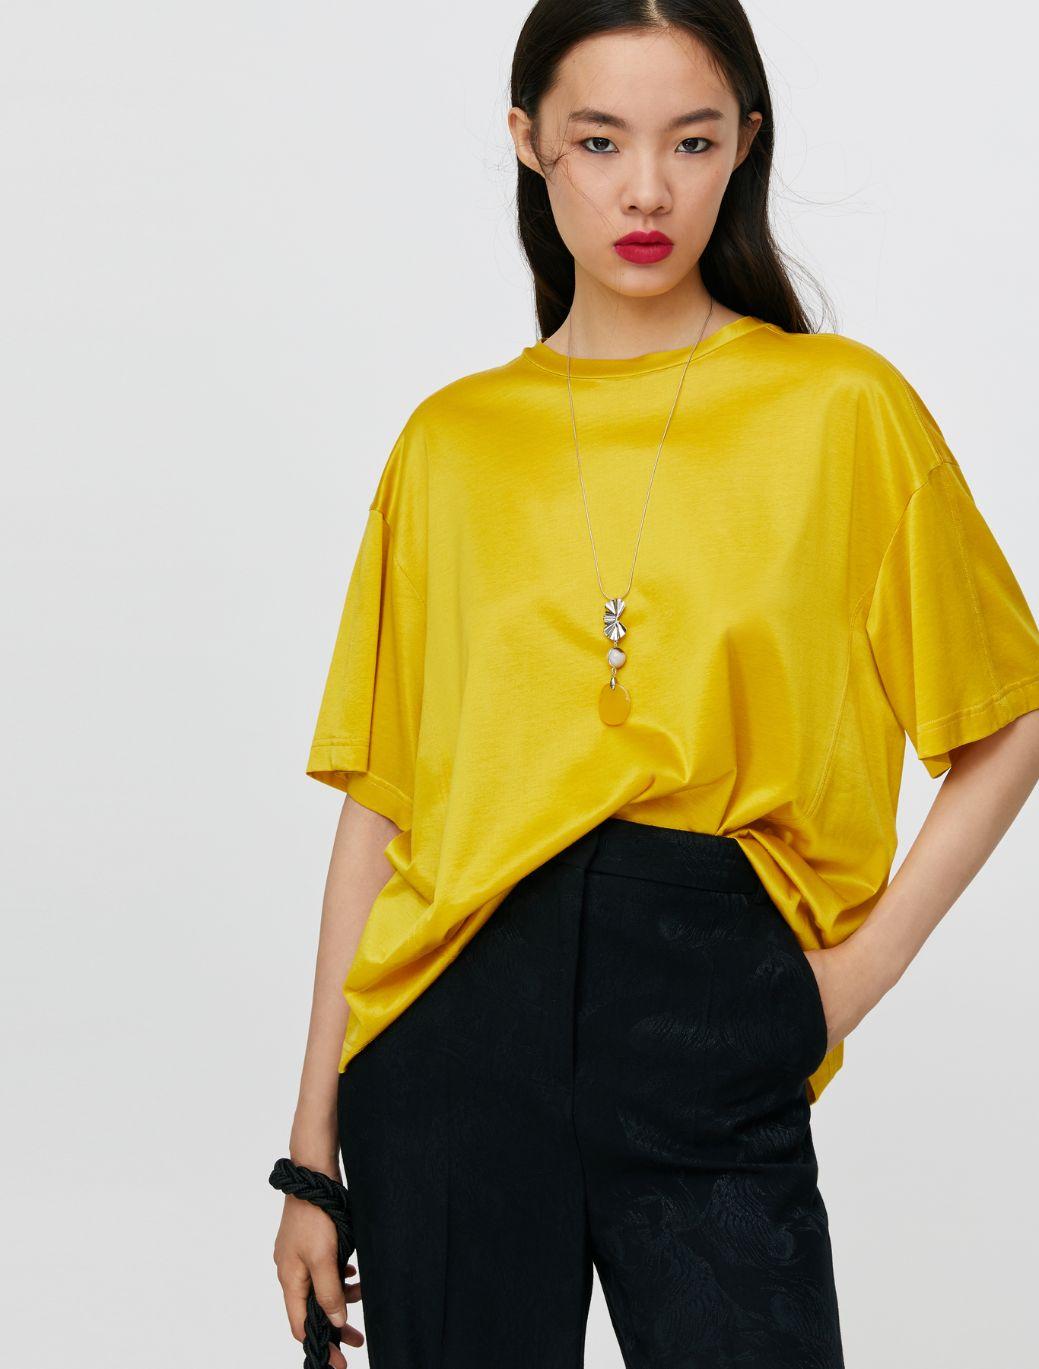 DARIA T-shirt mustard 1